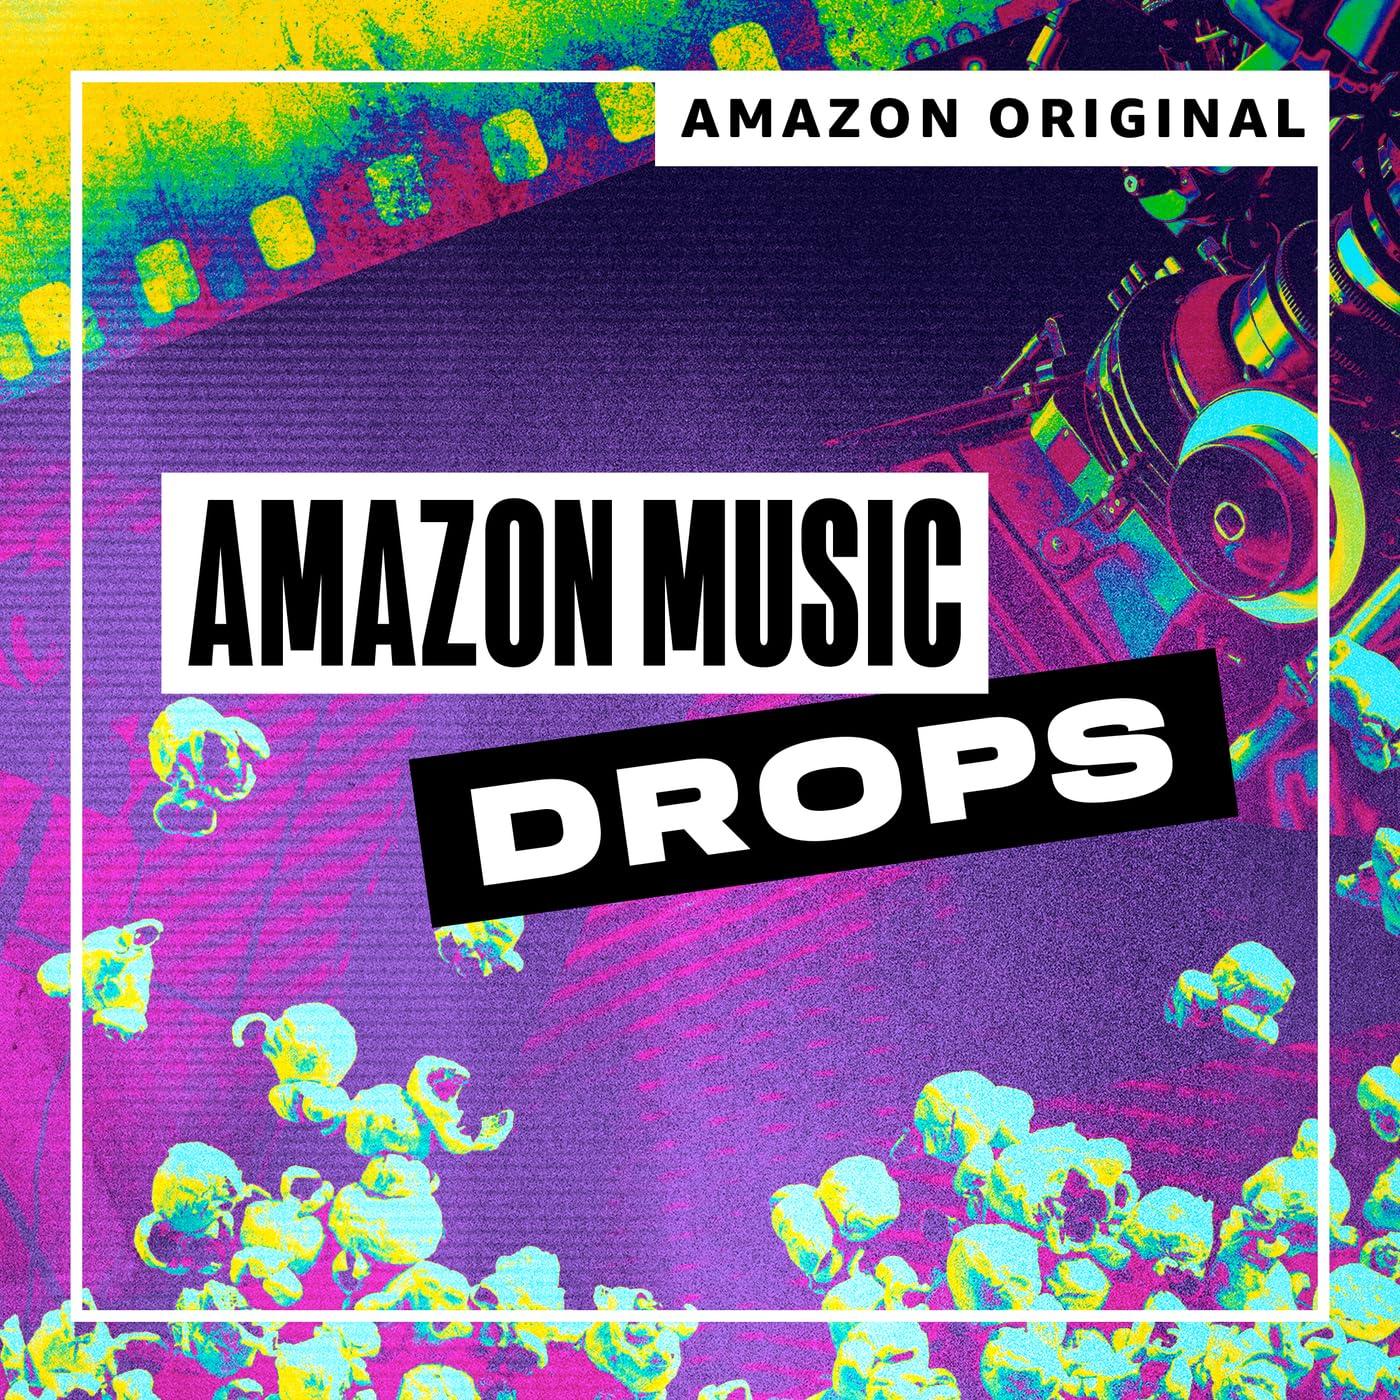 Amazon Music Drops